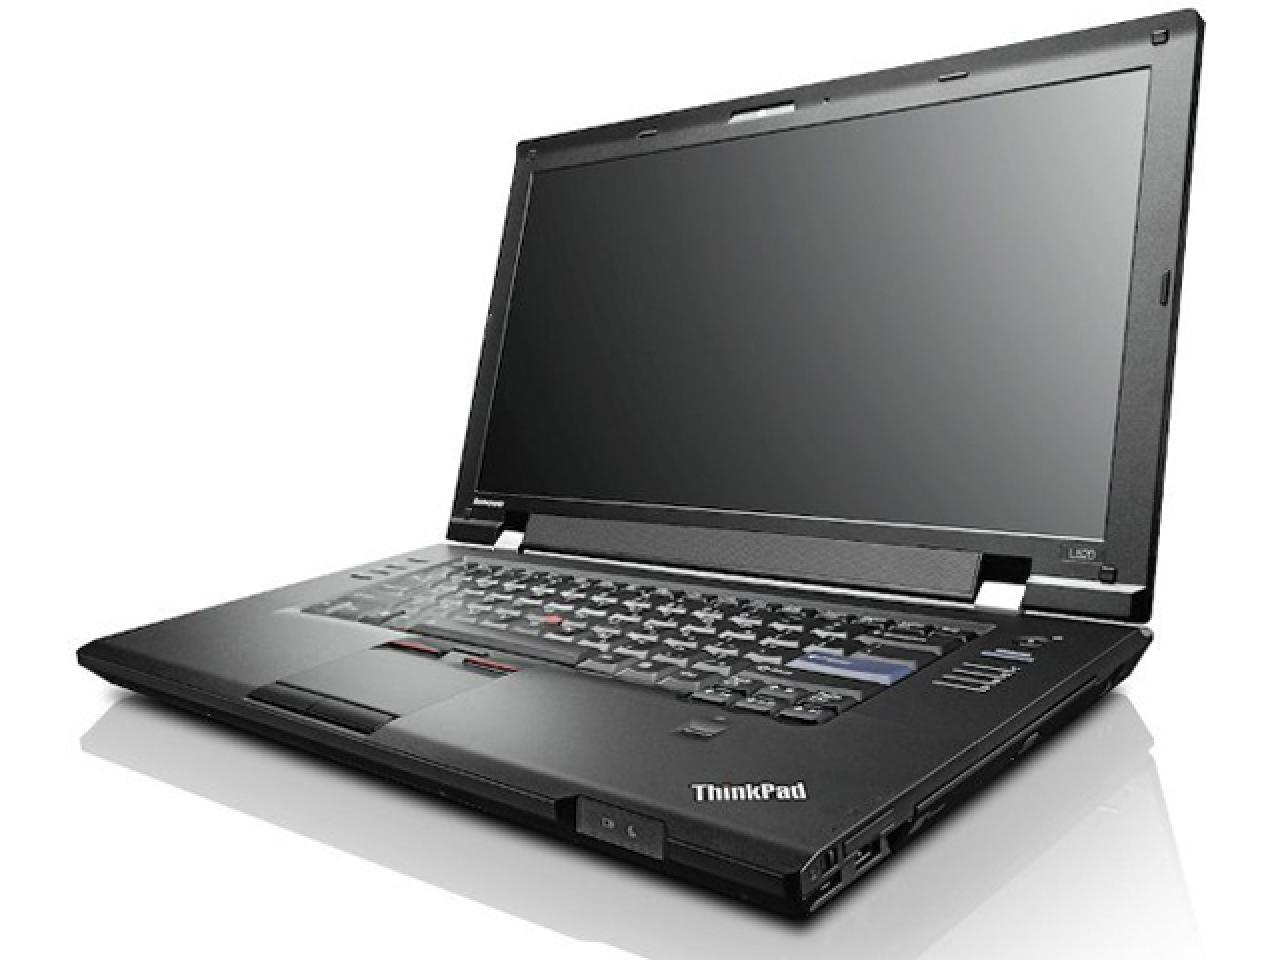 Lenovo ThinkPad L520  - shop.bb-net.de